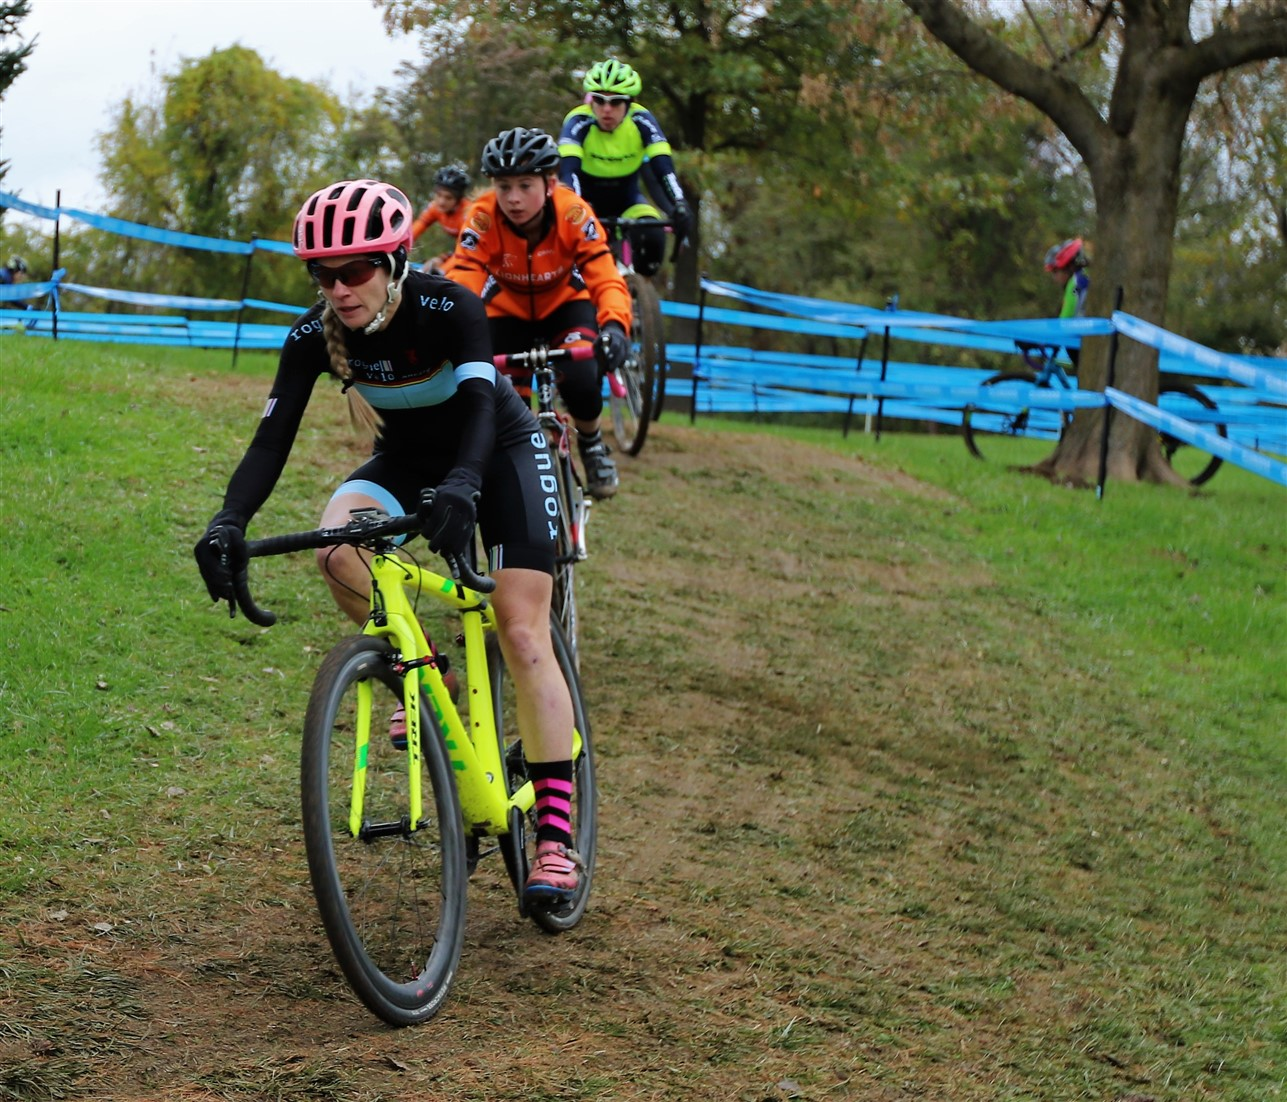 2017 10 29 78 Fairfield OH Cincinnati Cyclocross.jpg